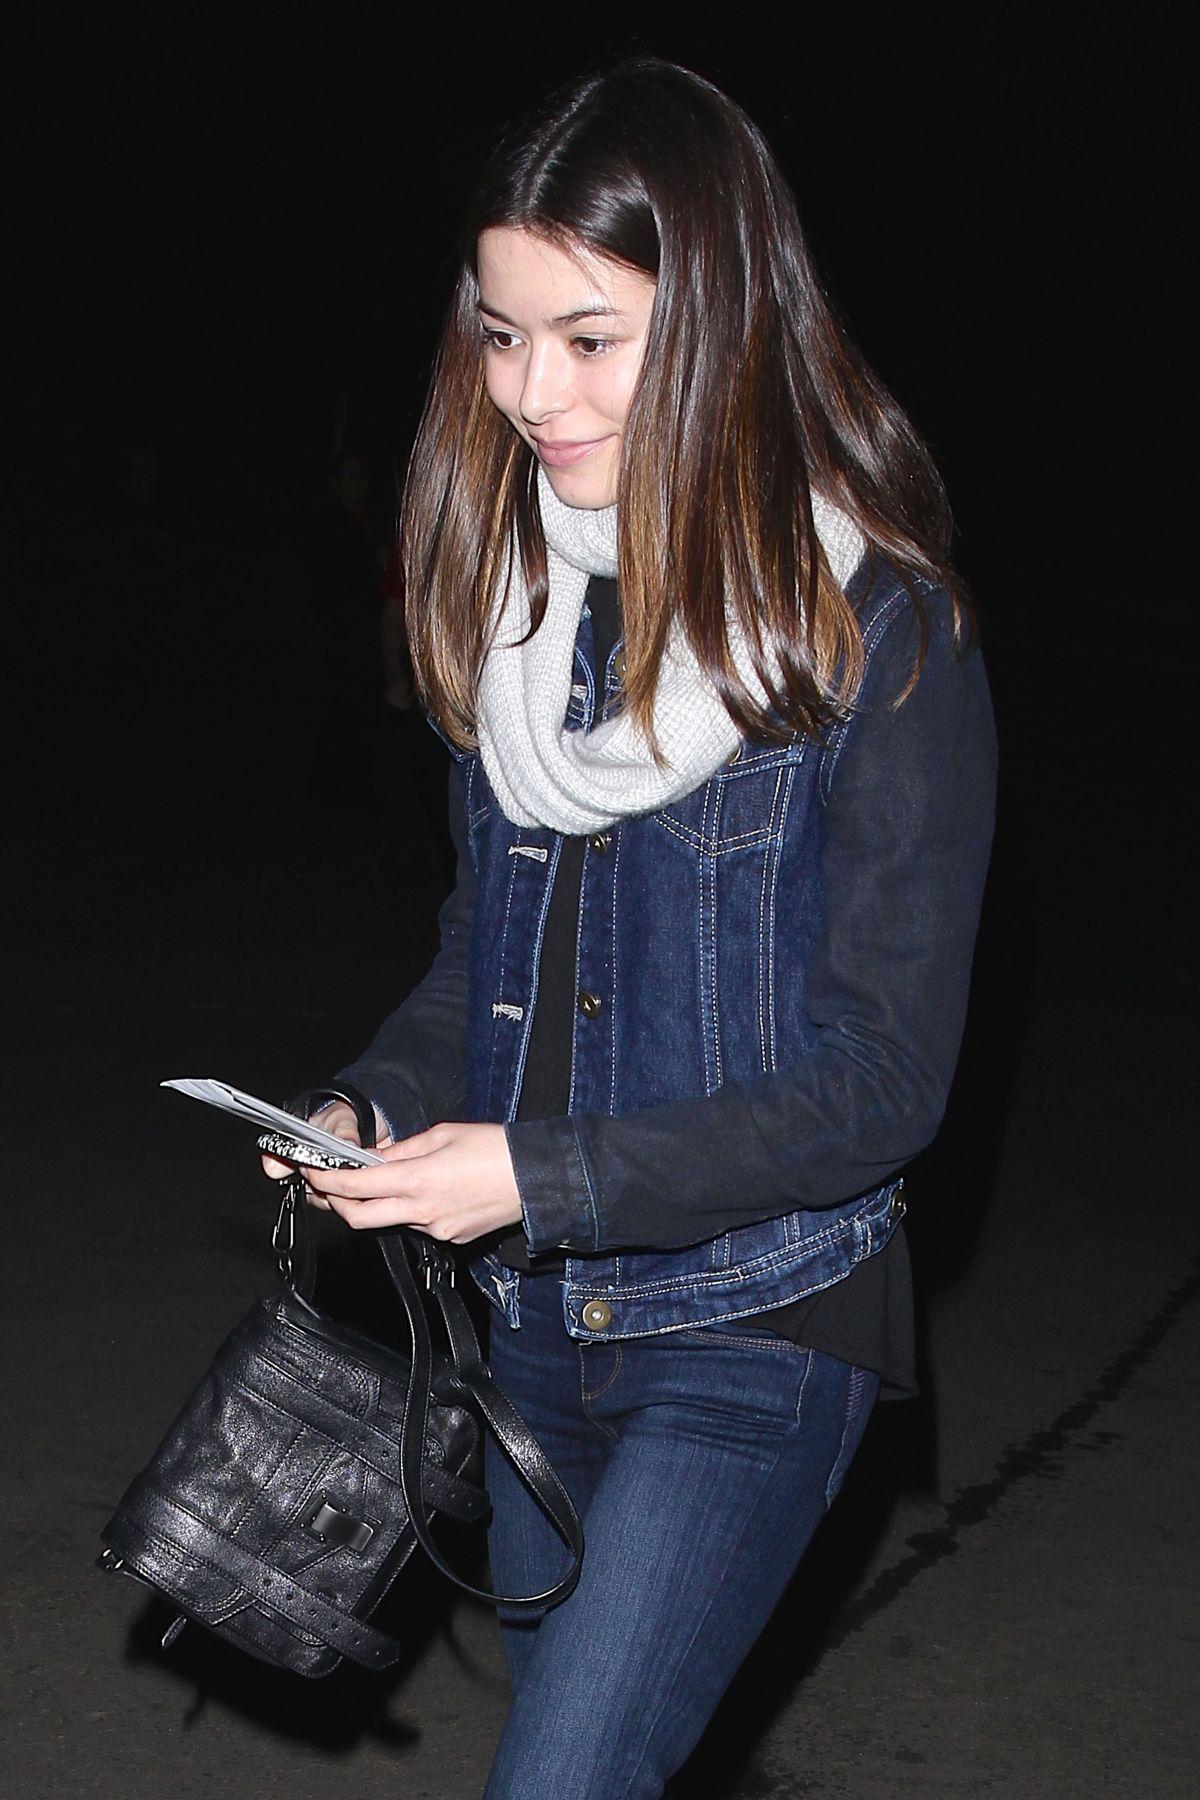 MIRANDA COSGROVE Arrives at Lana Del Rey Concert in Los Angeles